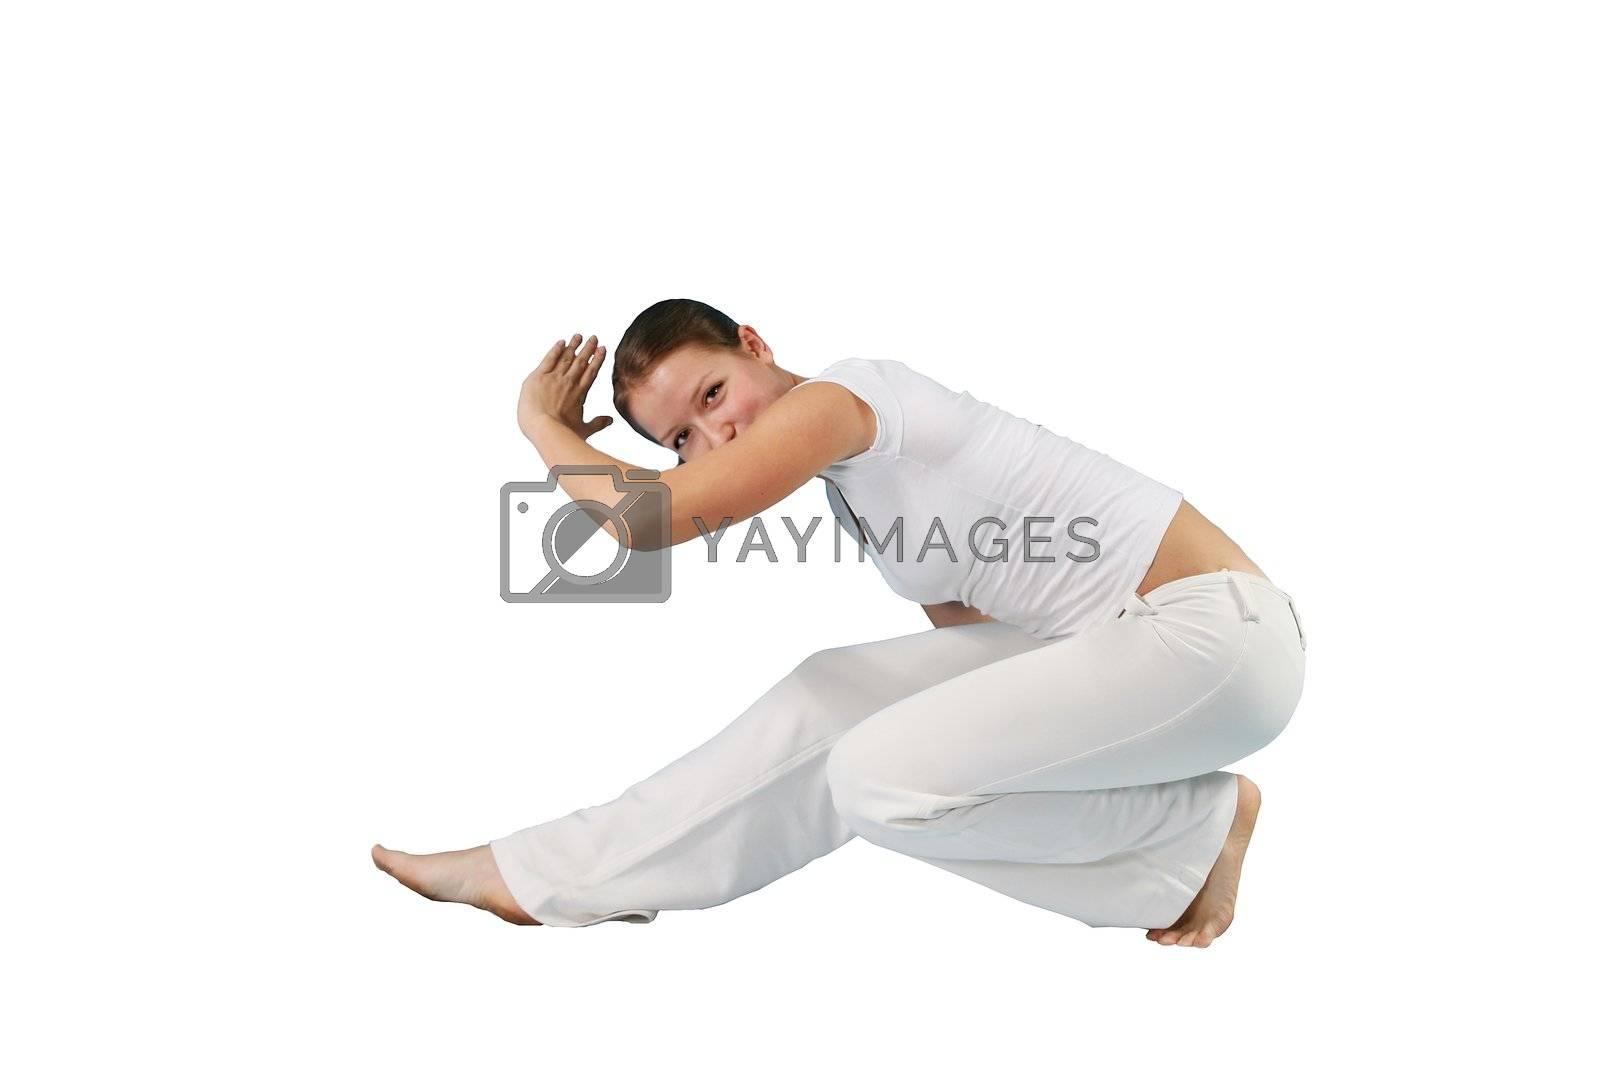 dieting fitness aerobics shape portrait young girls